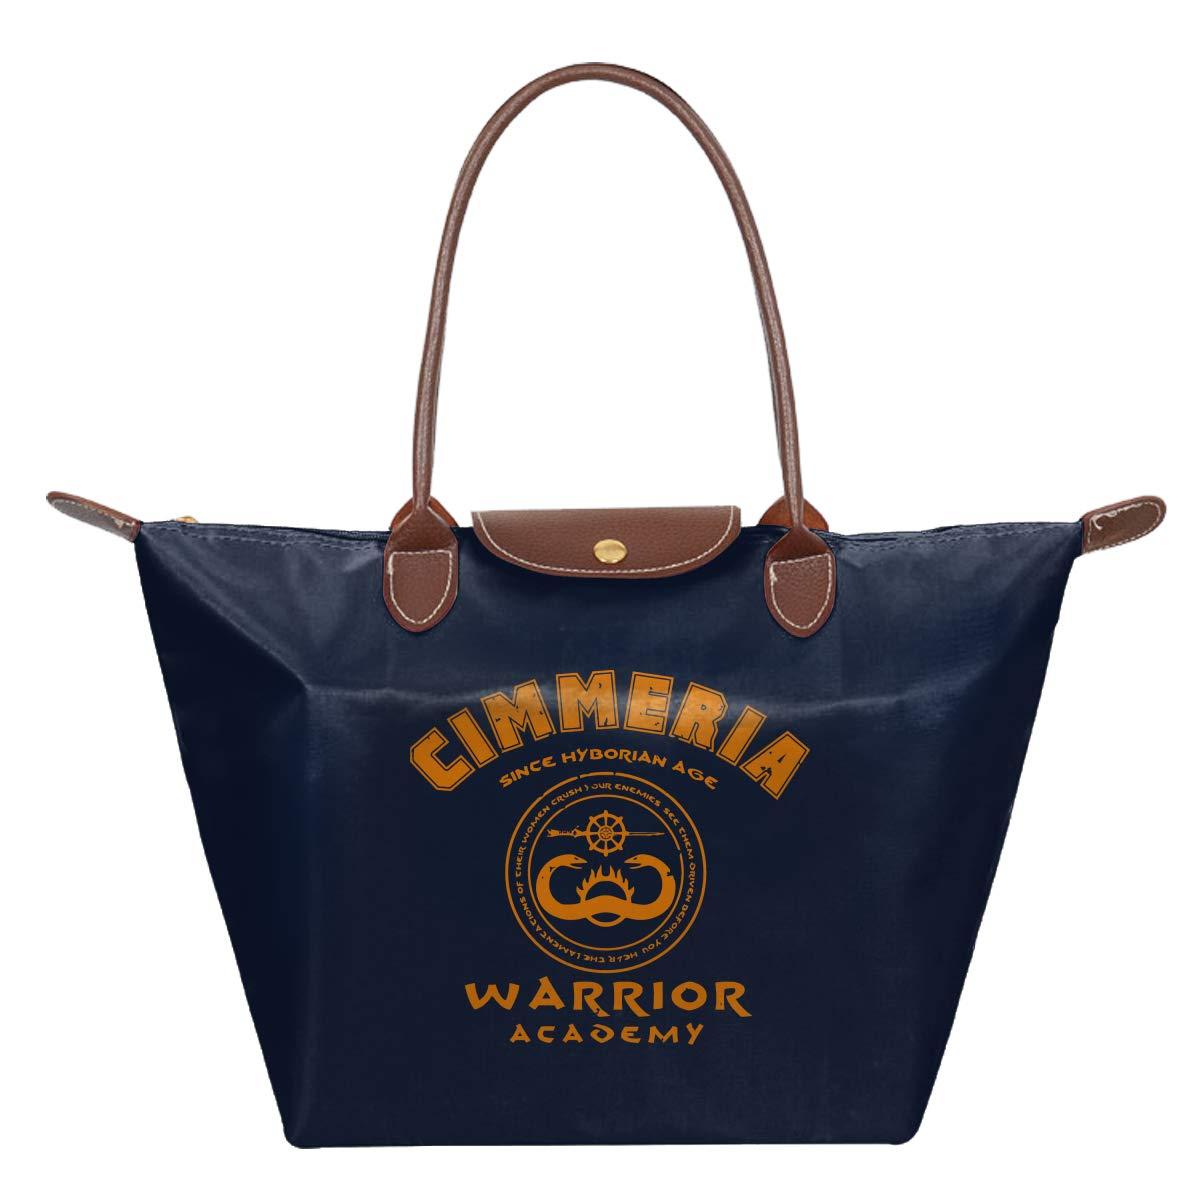 Cimmeria Warrior Academy Conan The Barbarian Waterproof Leather Folded Messenger Nylon Bag Travel Tote Hopping Folding School Handbags